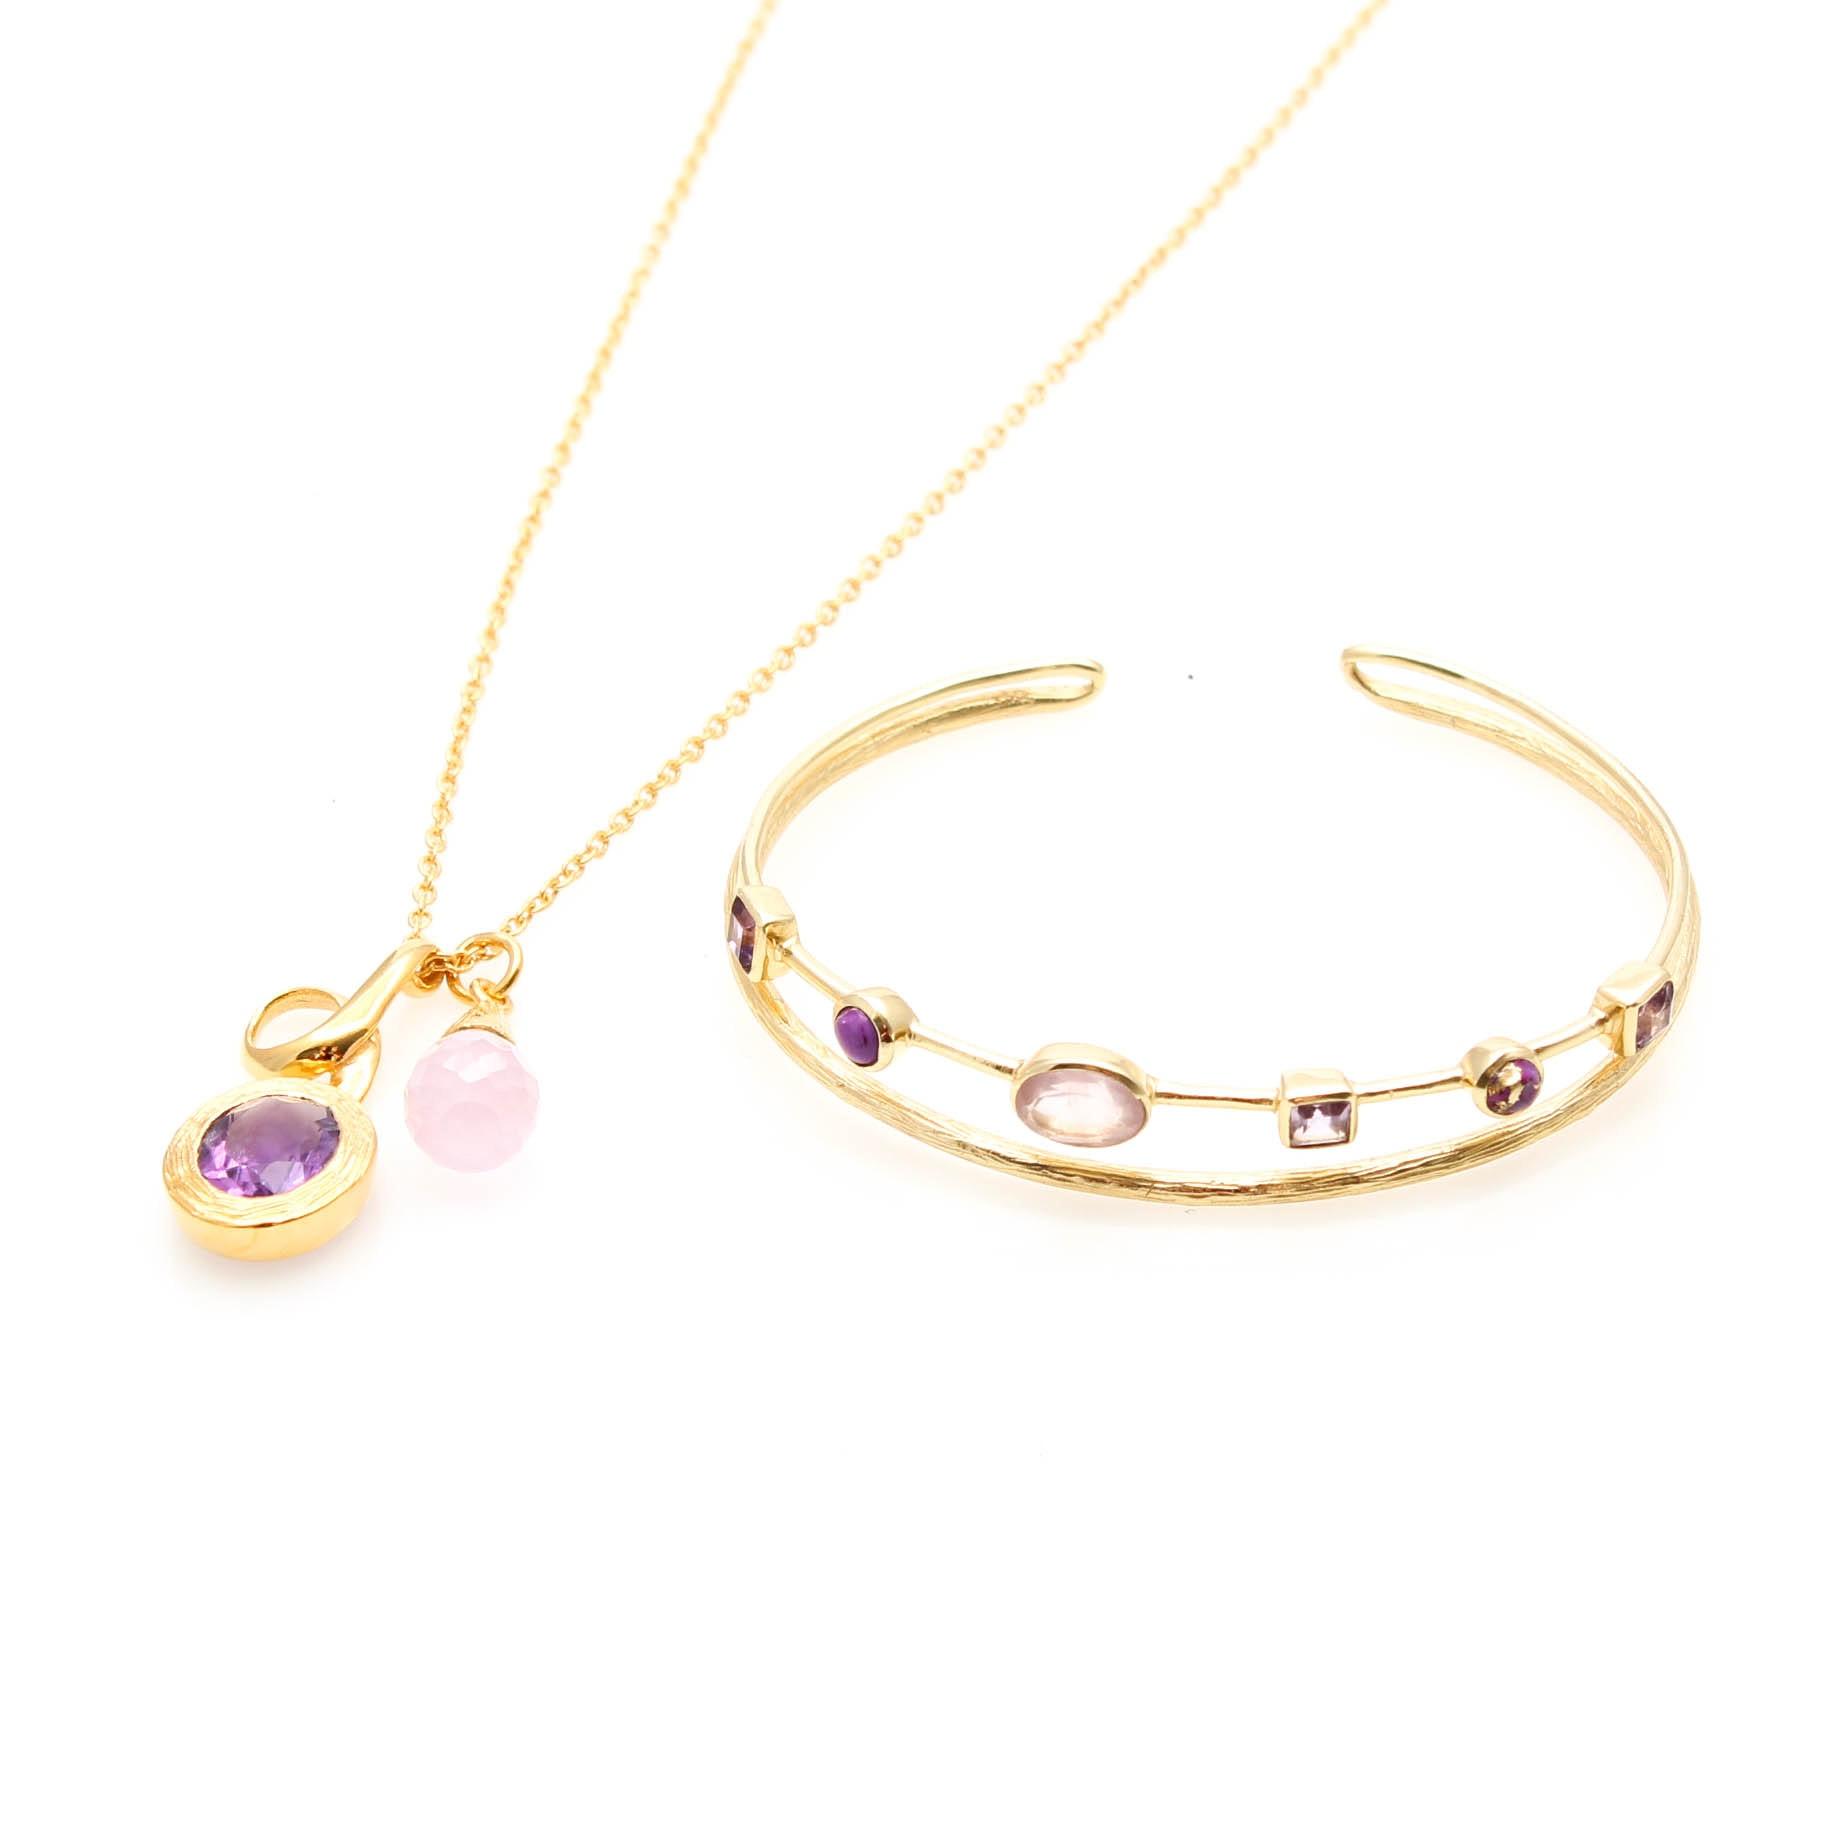 Gold Tone Rose Quartz and Amethyst Jewelry